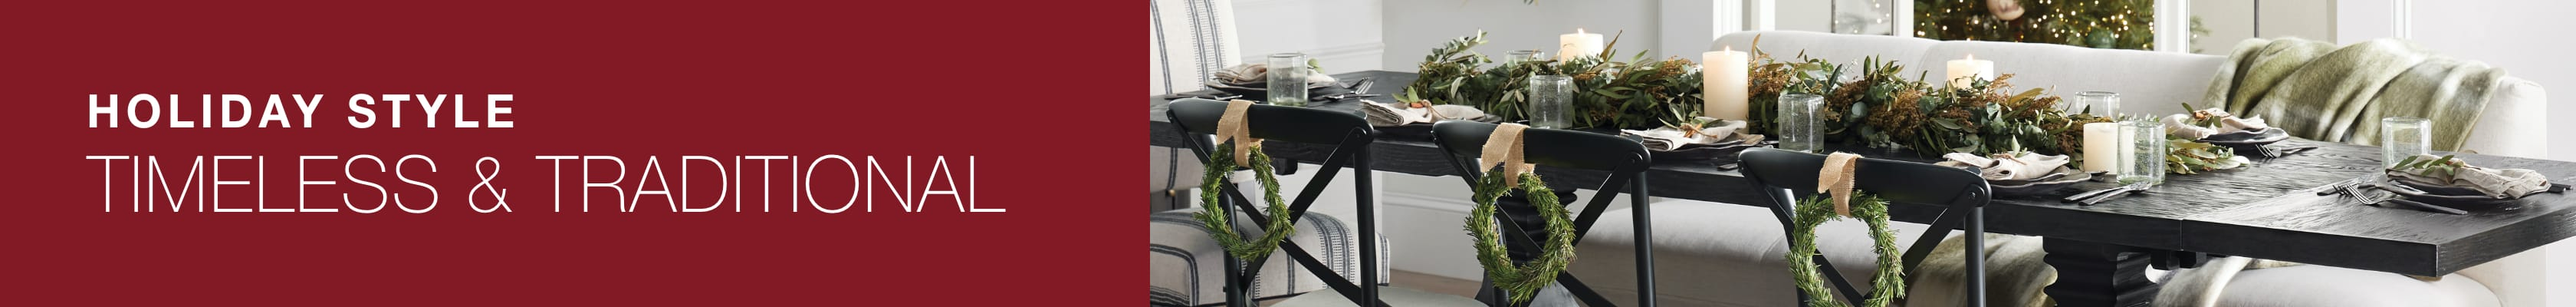 Shop Timeless & Traditional at Arhaus this holiday season